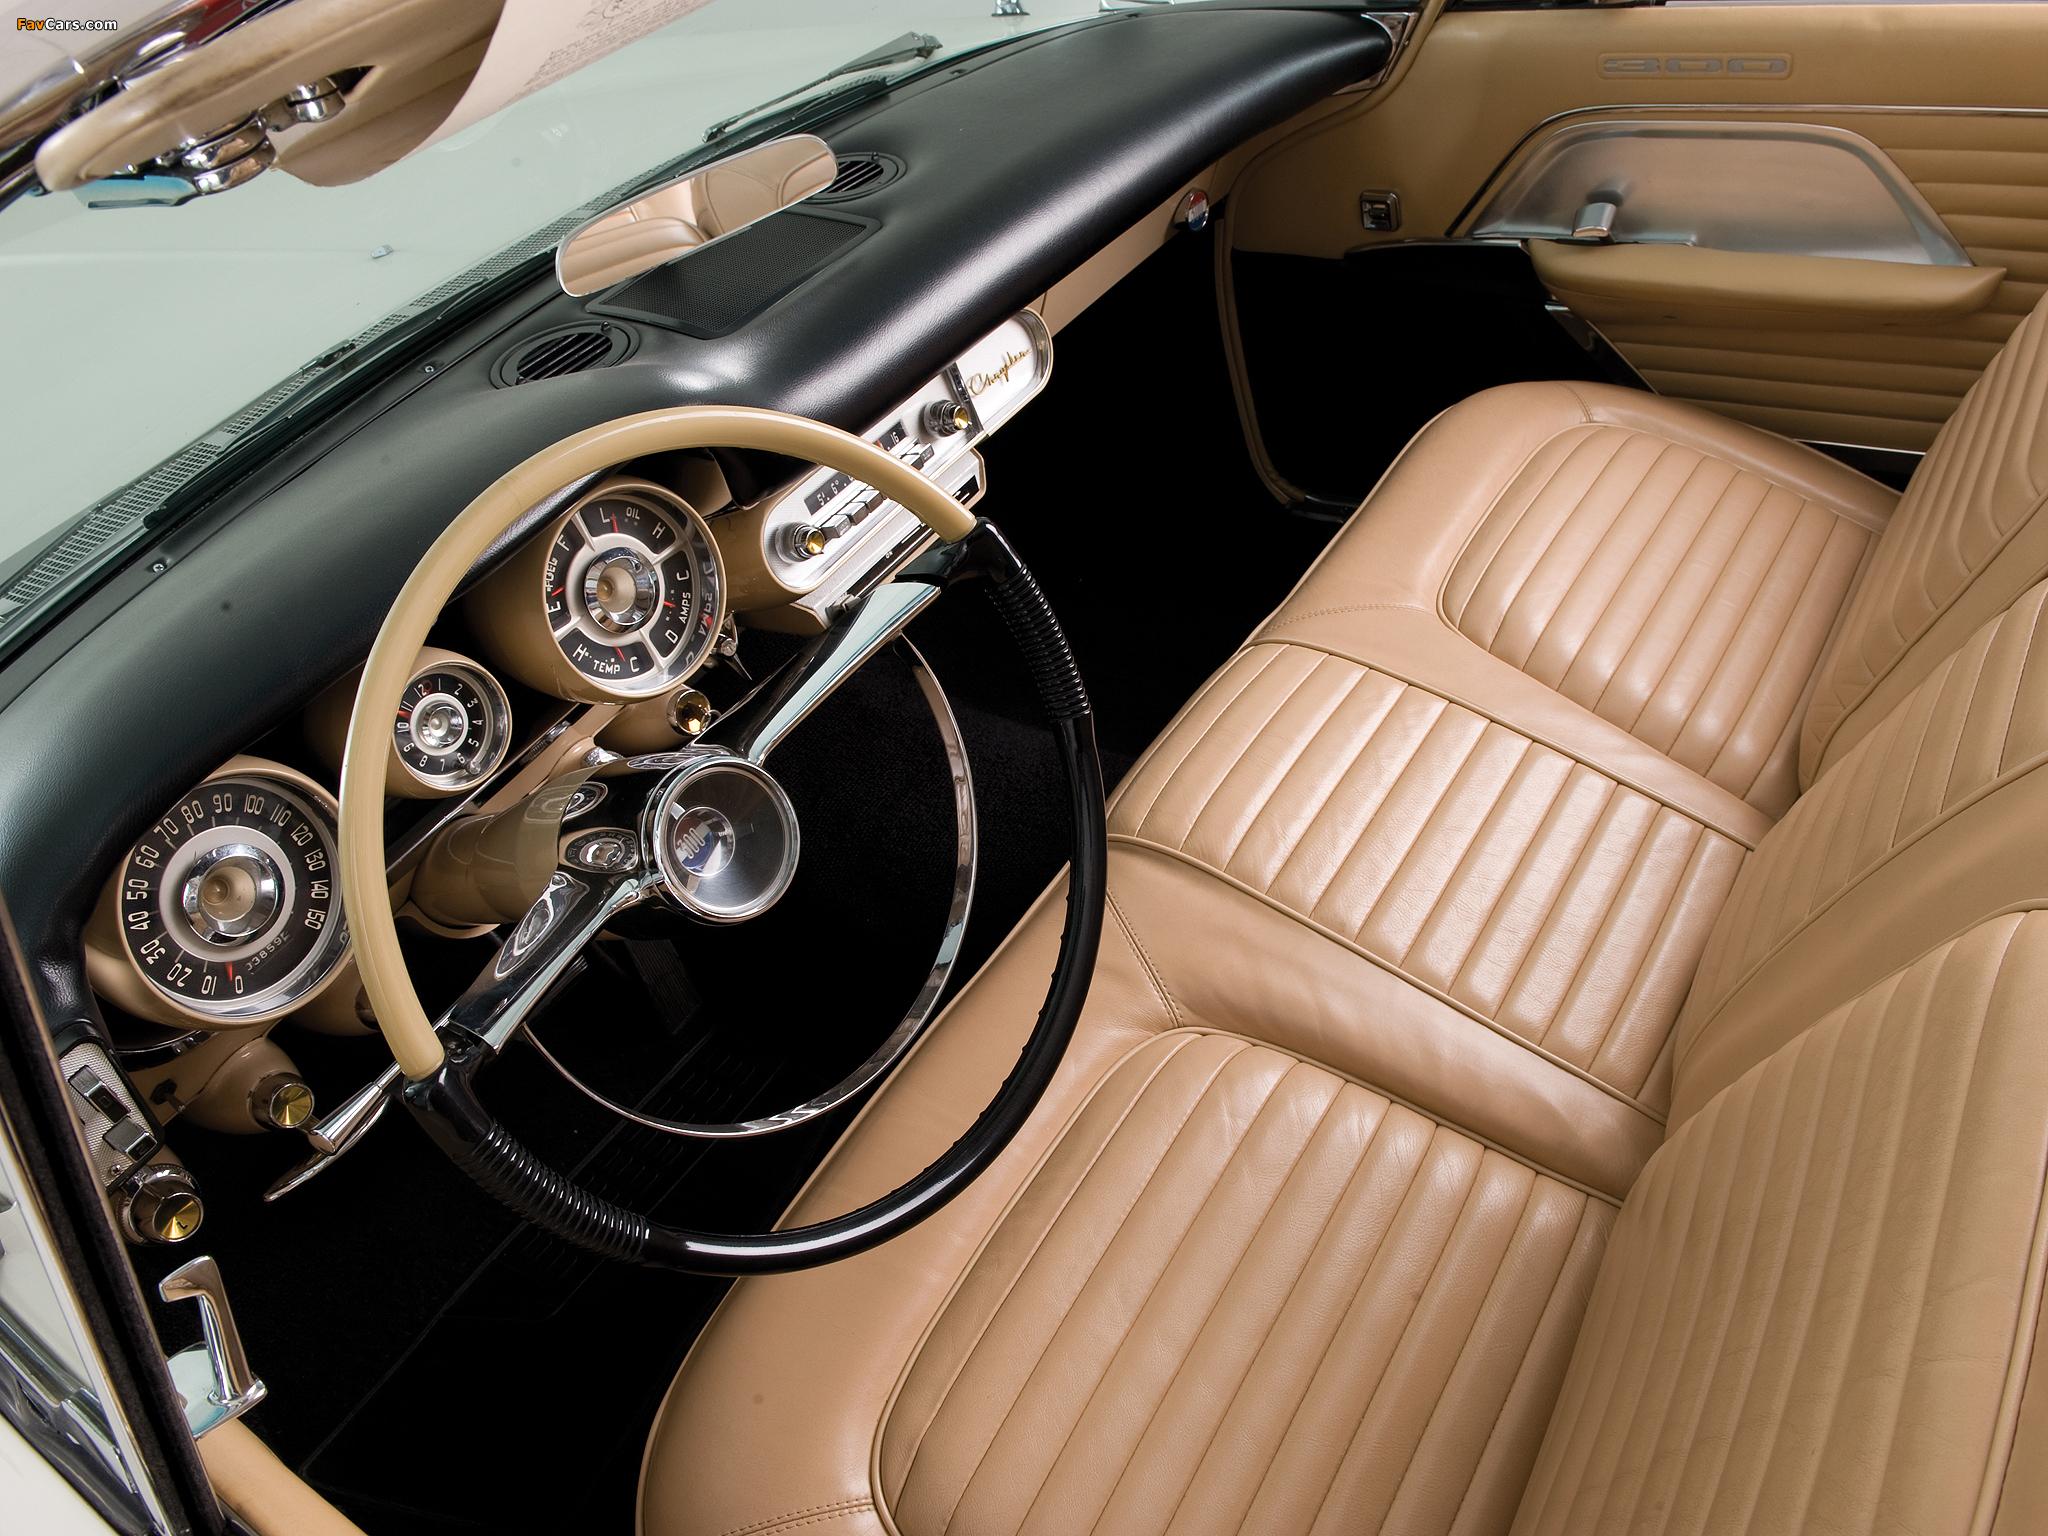 Chrysler 300 Letter Series III (300C) 1957 - 1957 Cabriolet #3